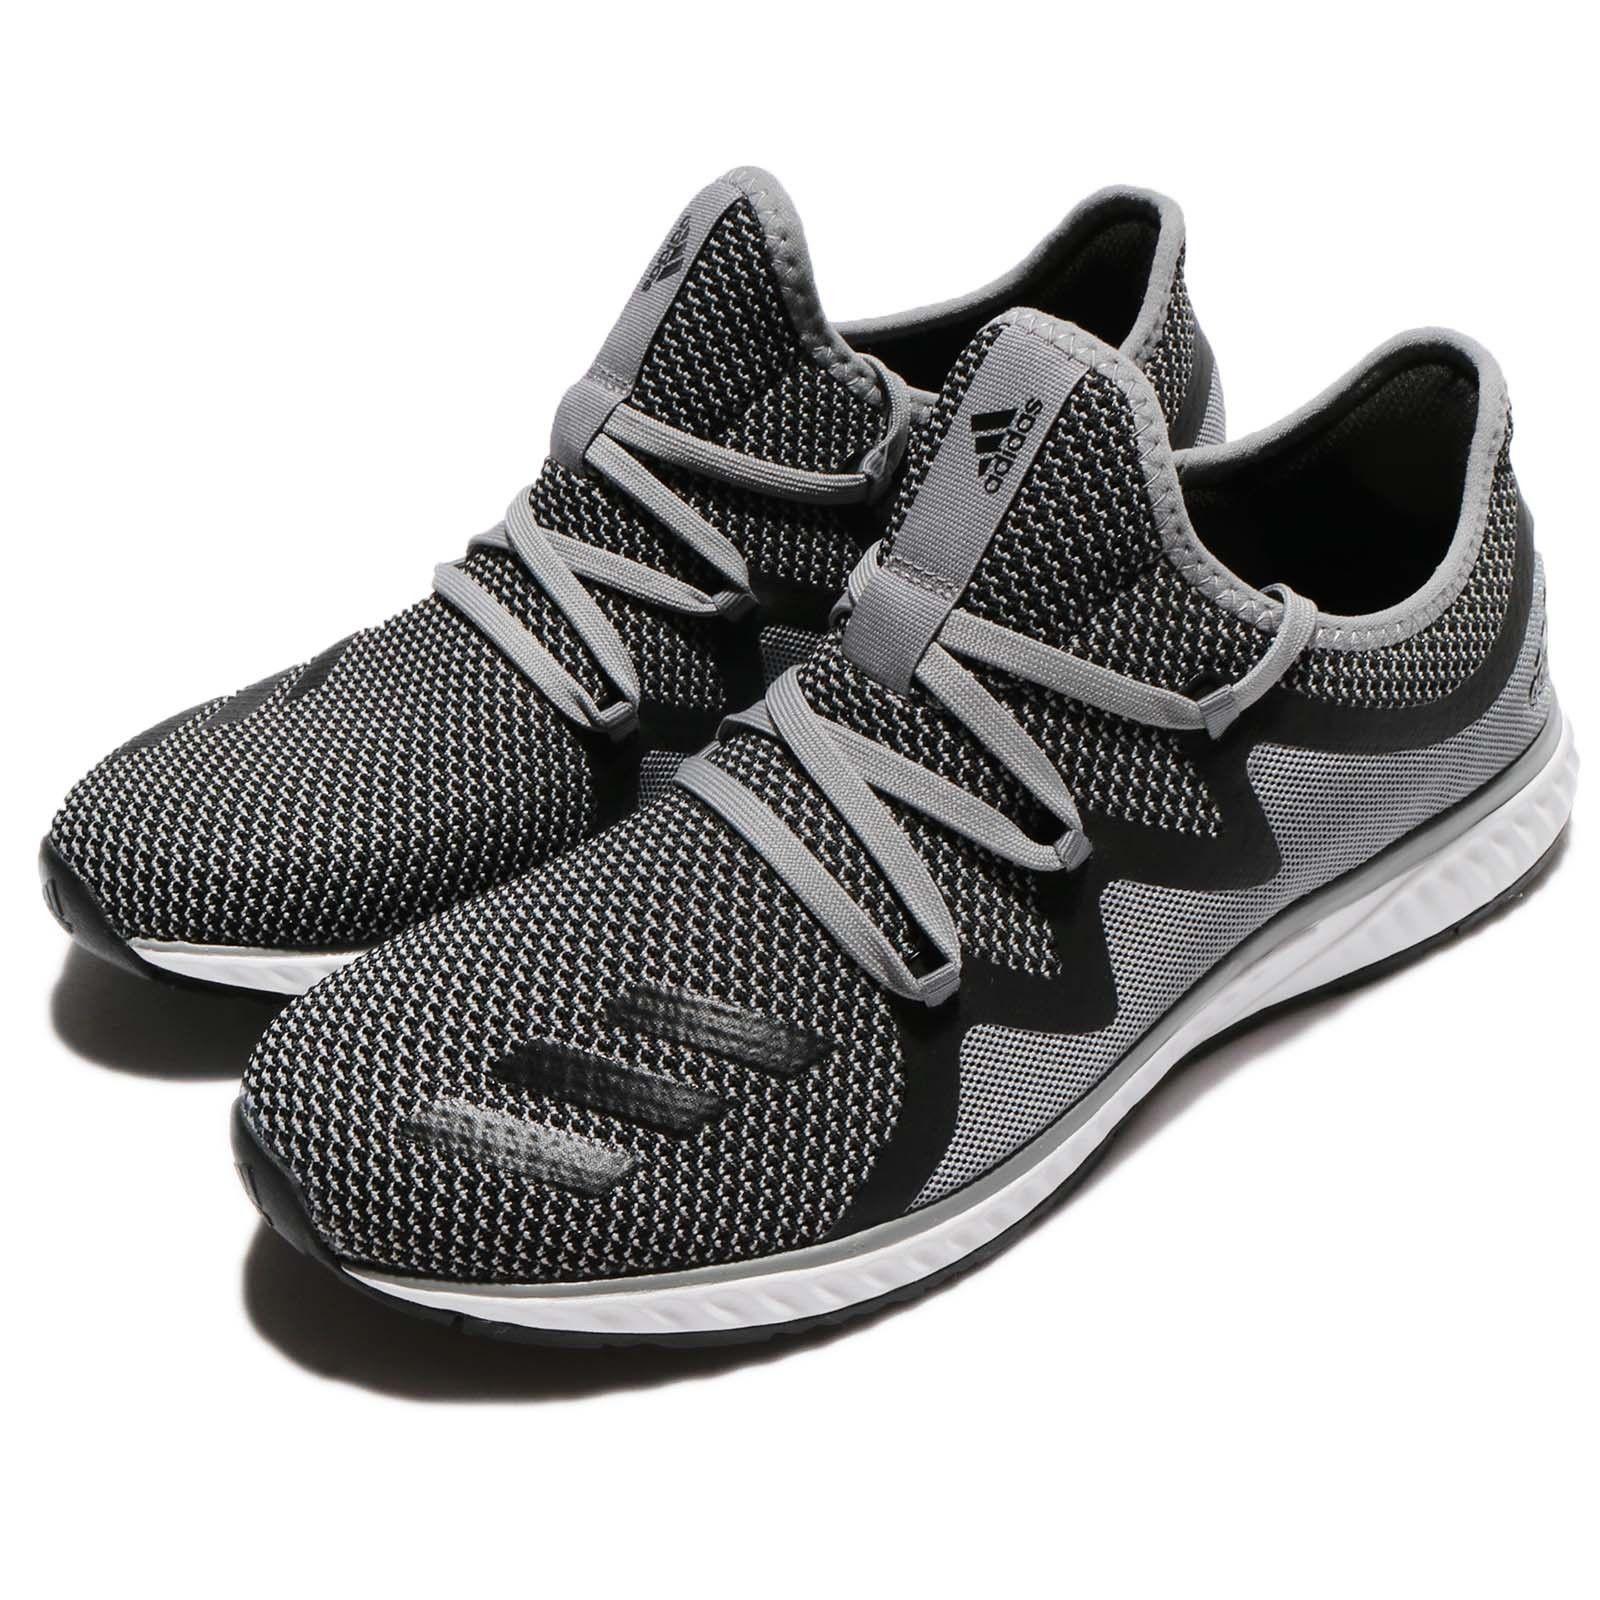 Shoes Adidas Running M Men Black Manazero Grey Bw1398 Sneakers qfzqSO